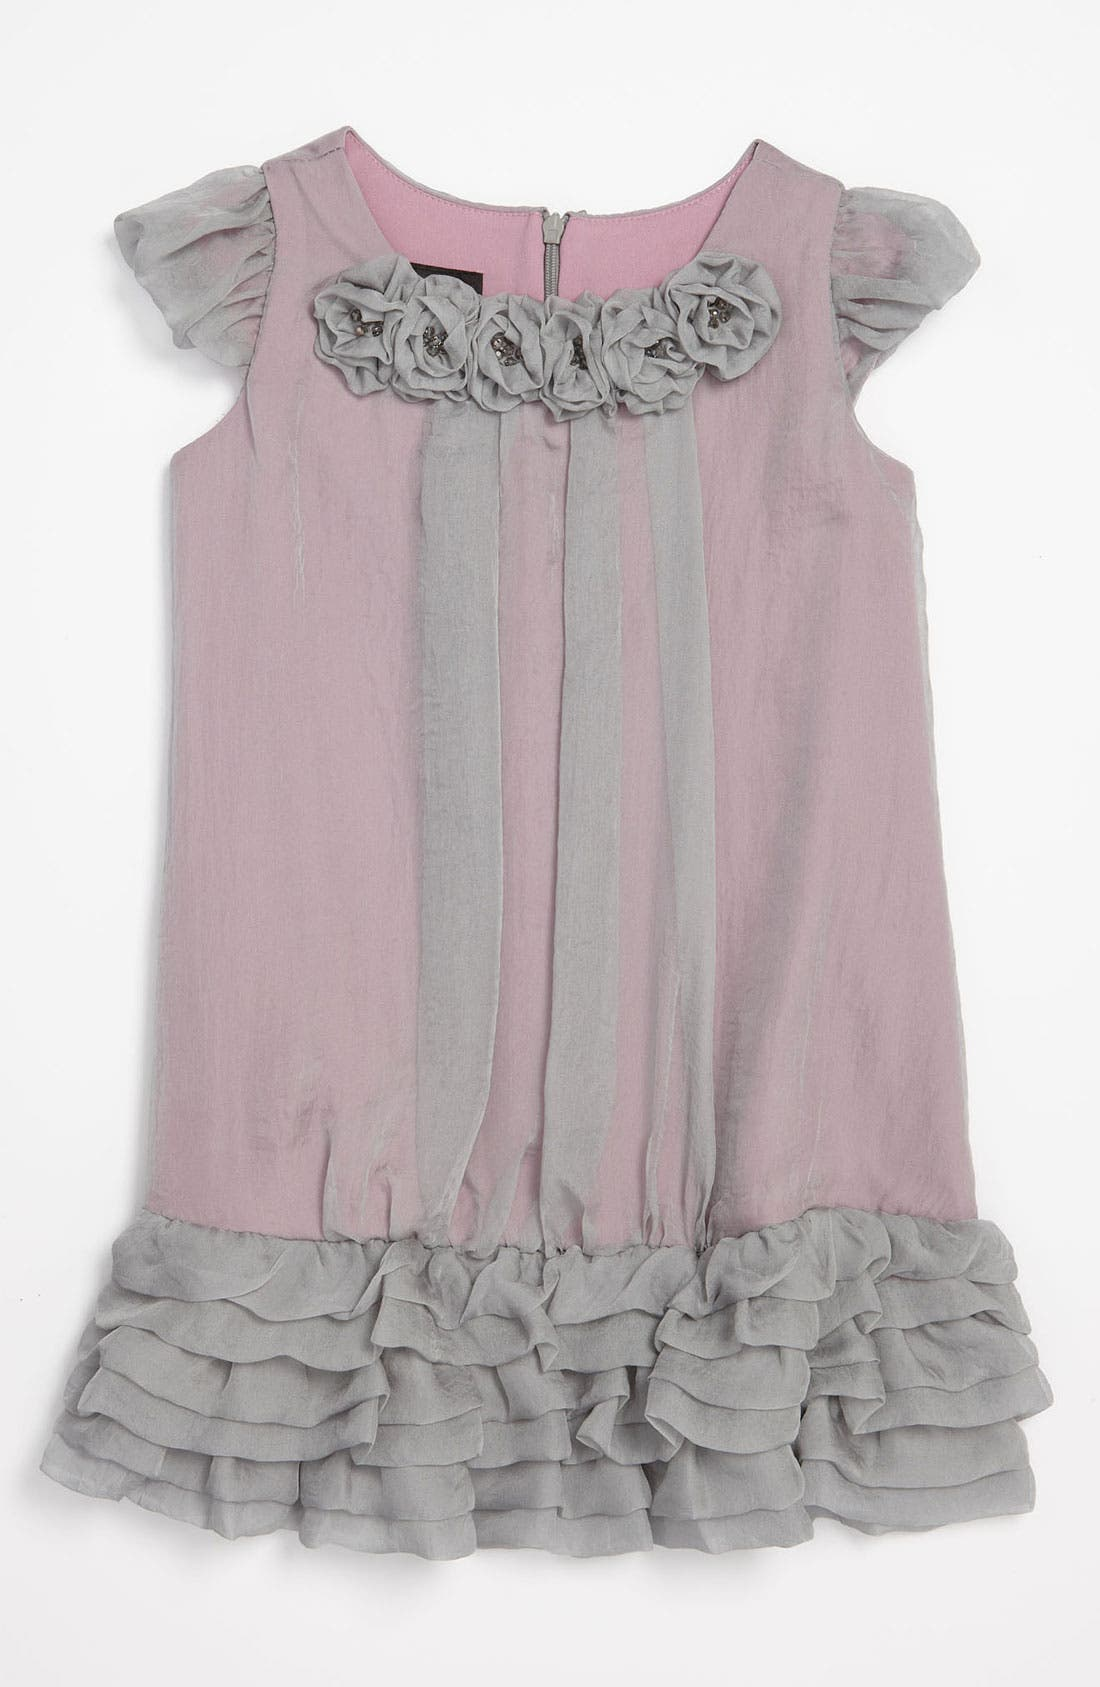 Main Image - Isobella & Chloe 'Miranda' Dress (Toddler)